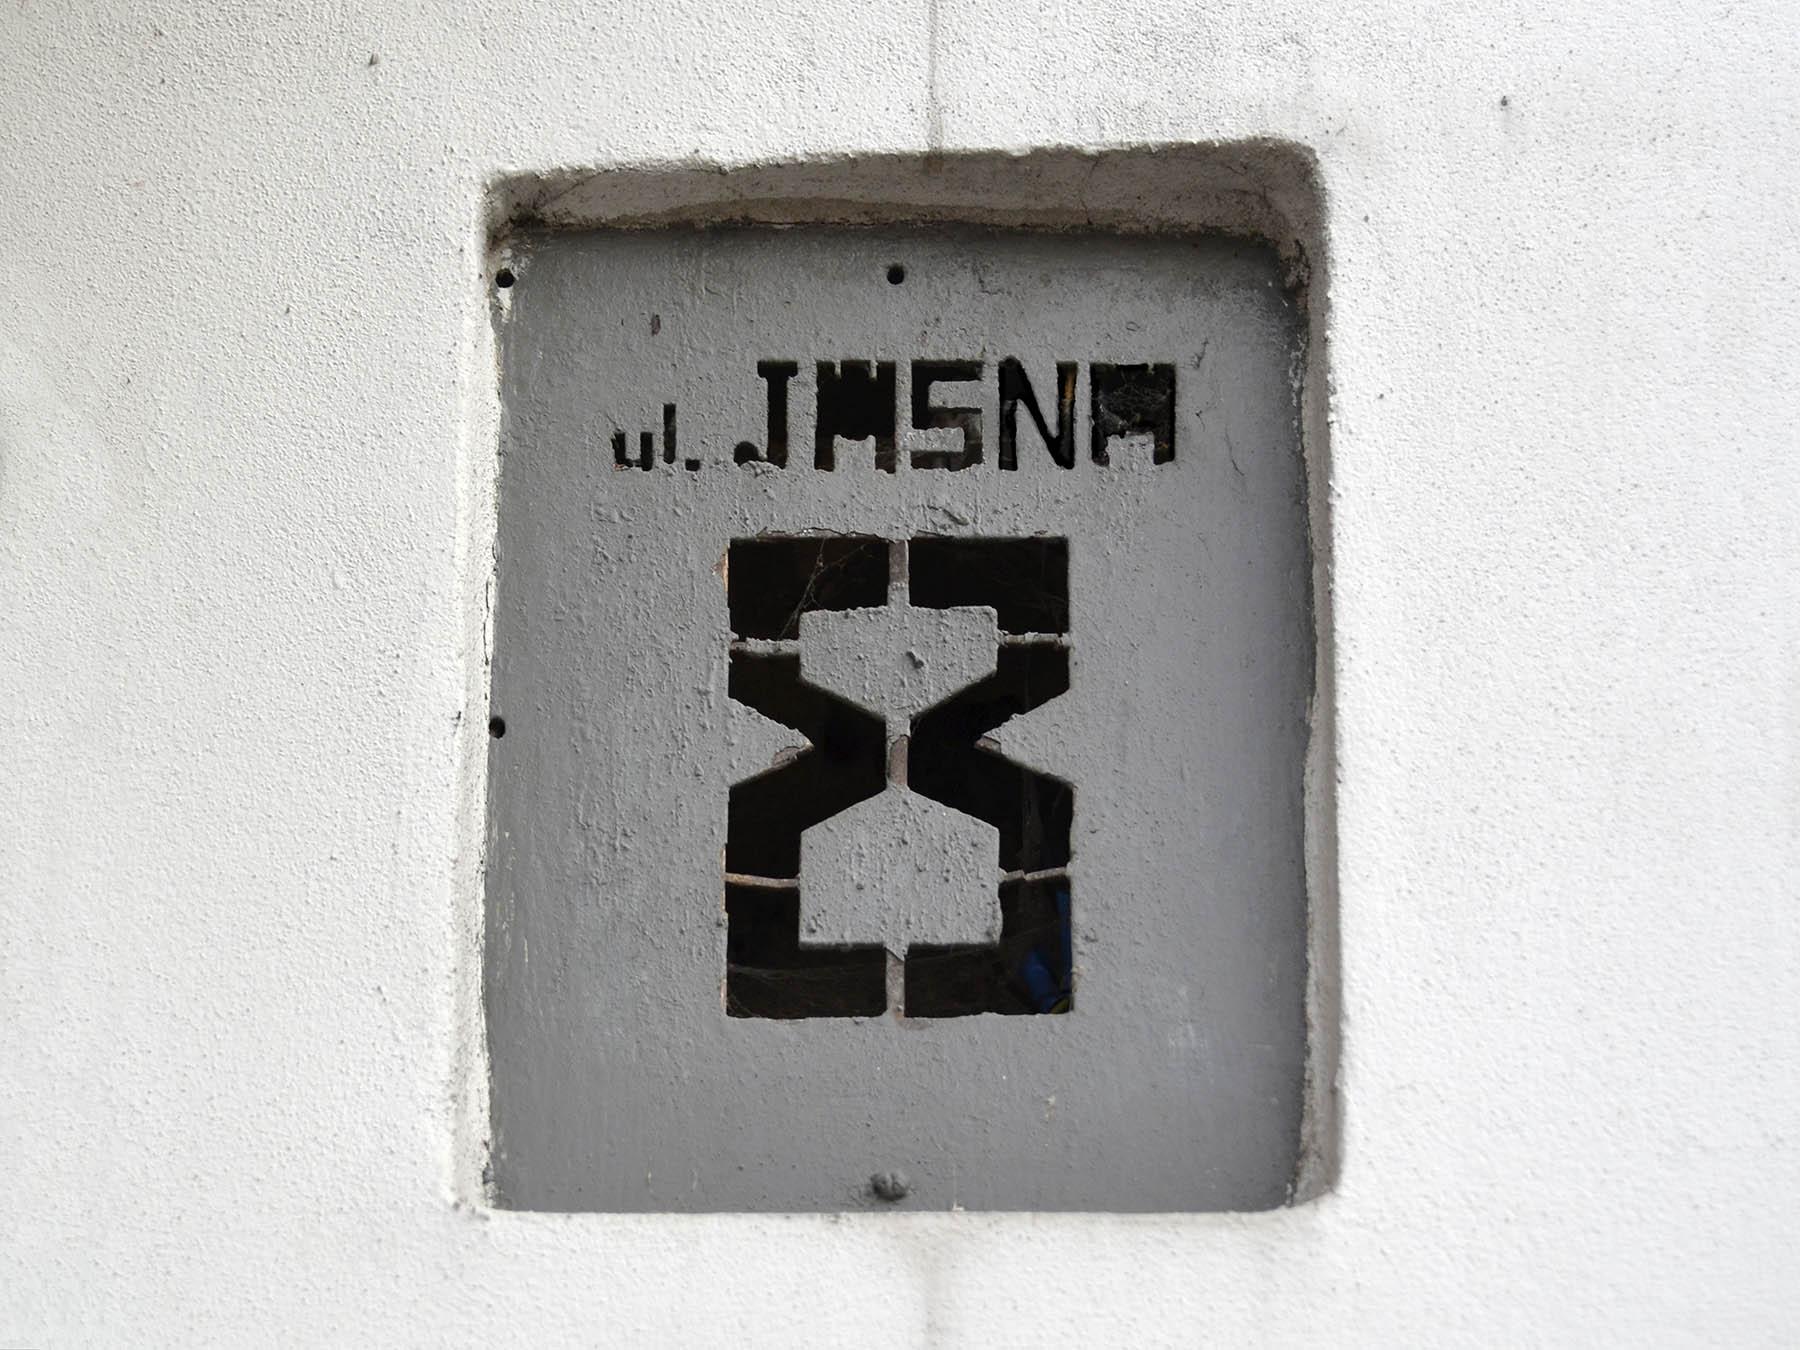 Poland 05 Tomasz Smutek @tomasz_smutek lo